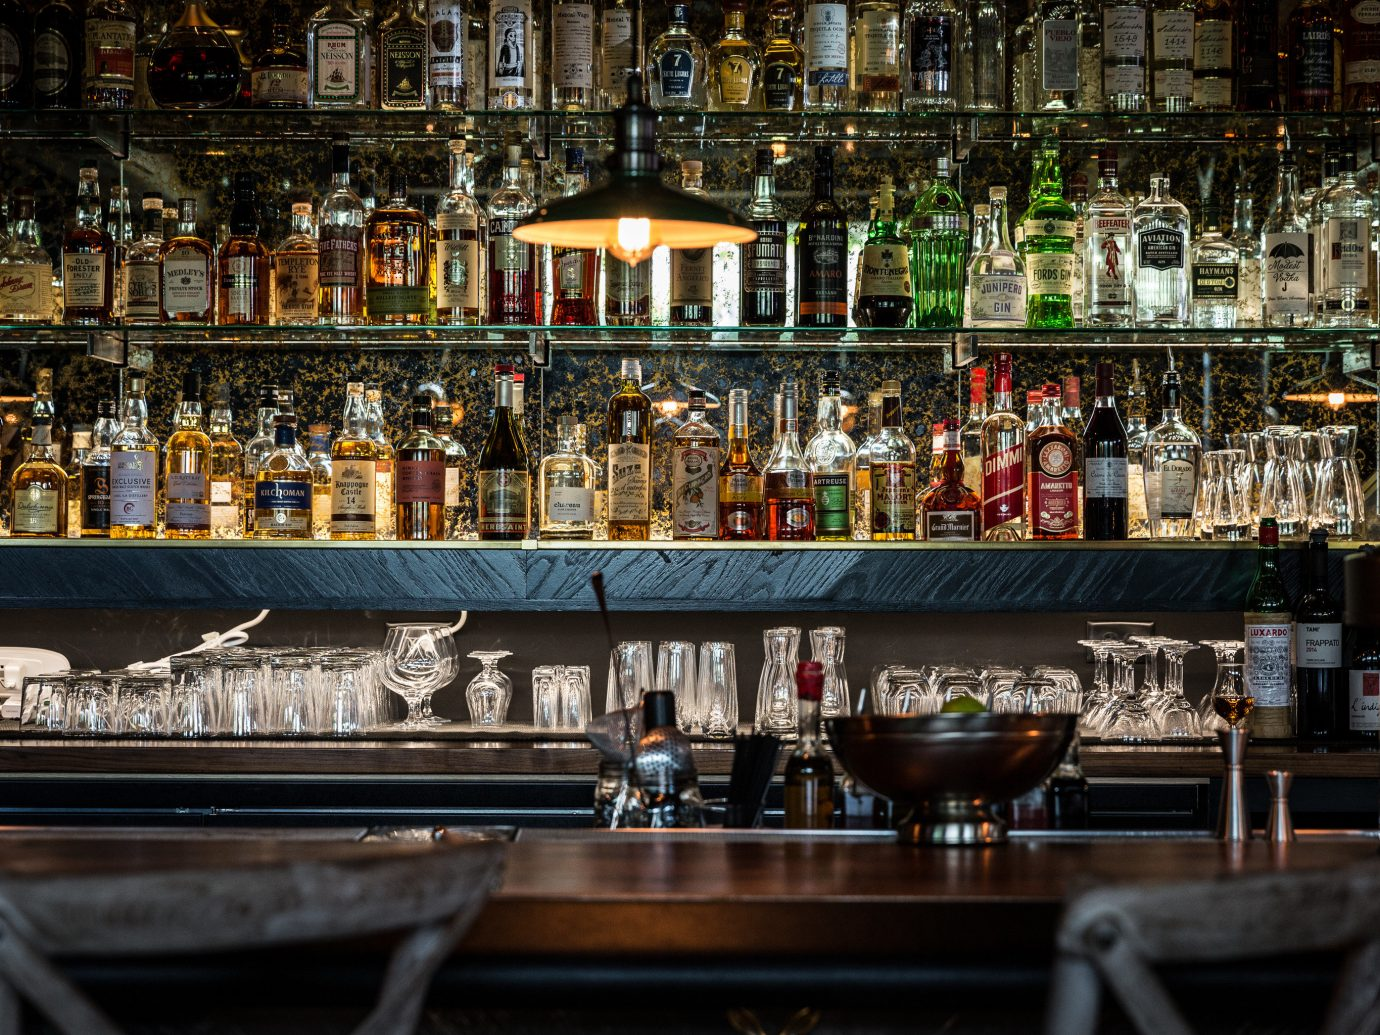 Arts + Culture Food + Drink Hotels Weekend Getaways indoor Bar restaurant Drink